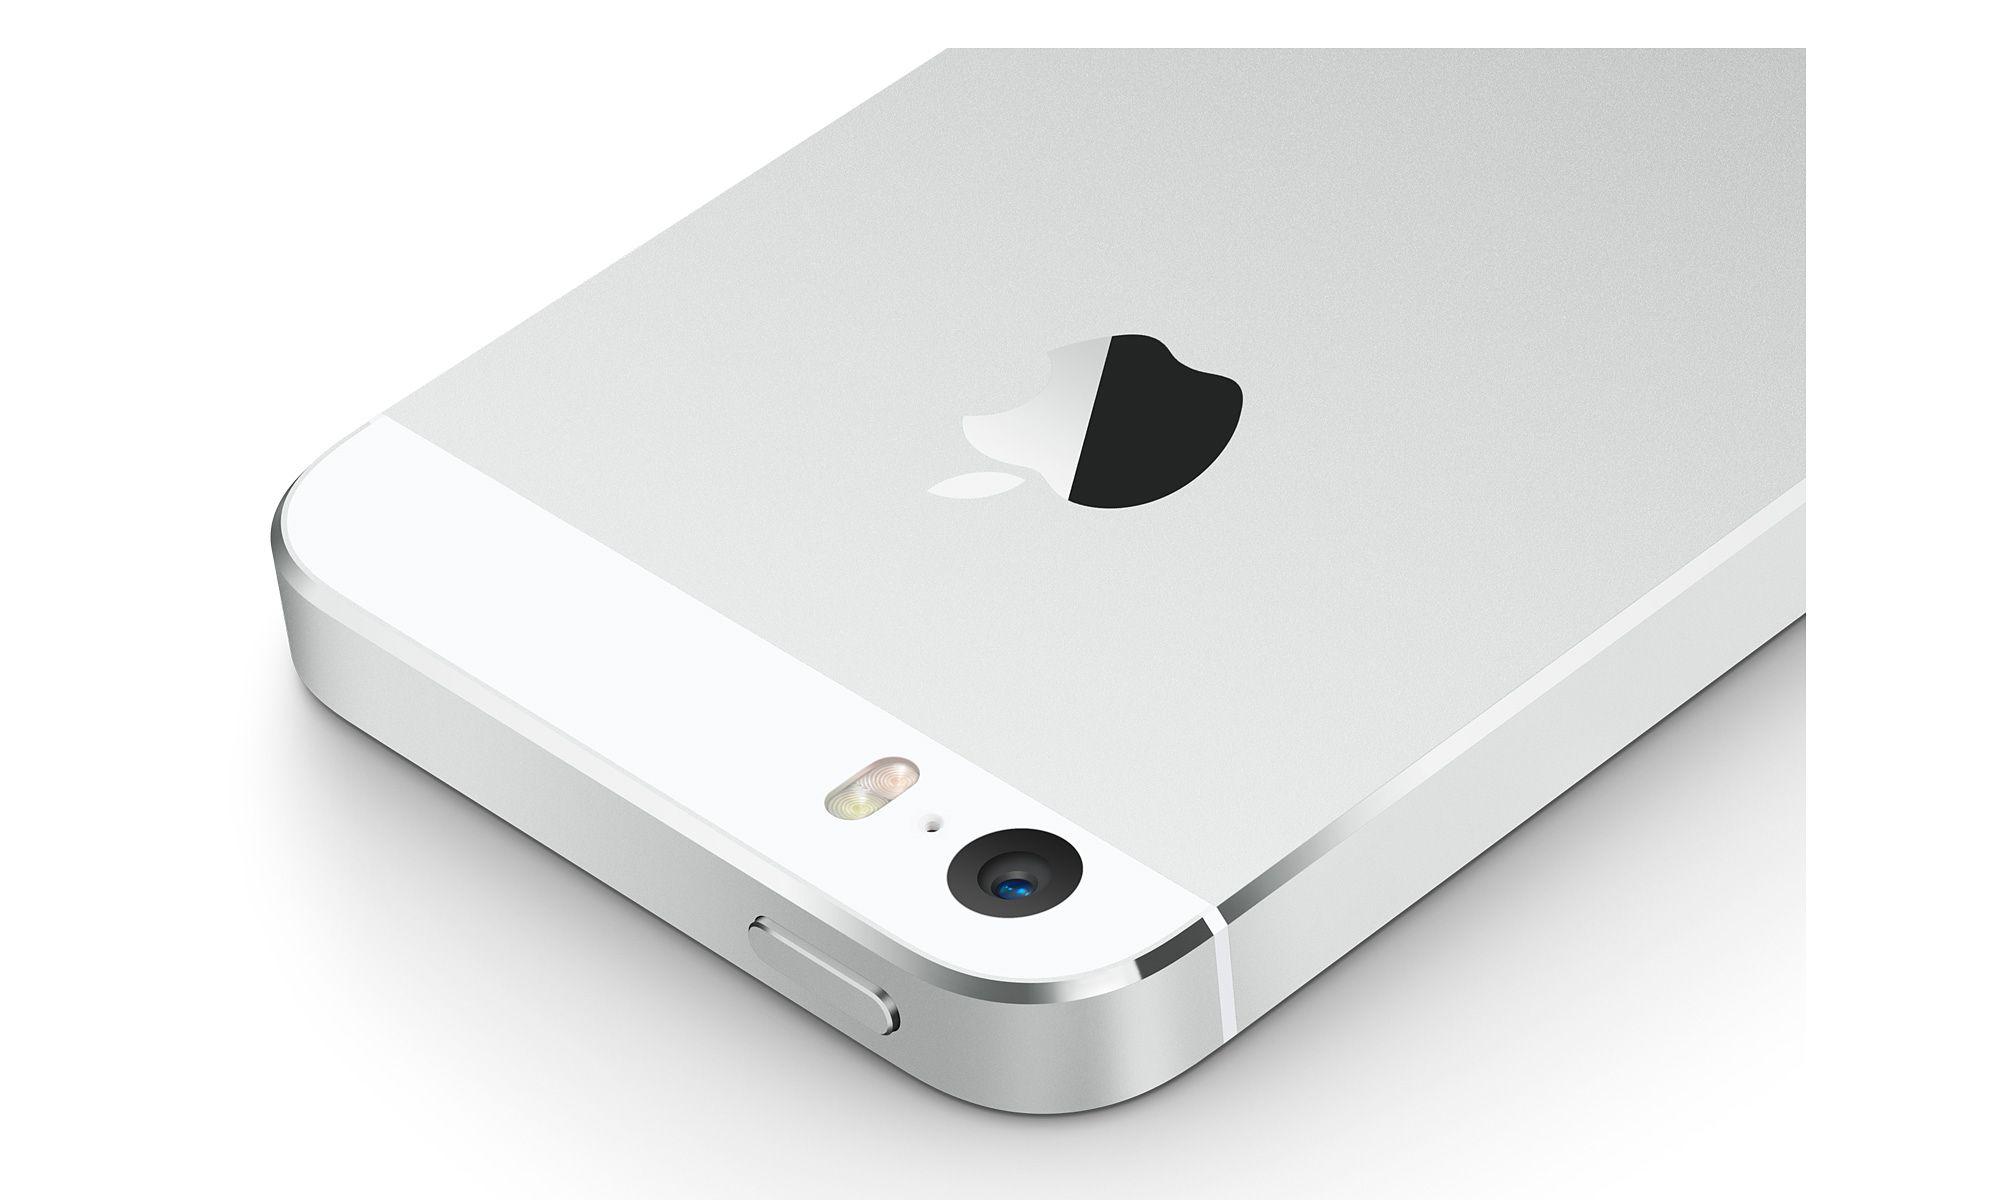 iPhone 5 top wake-sleep button